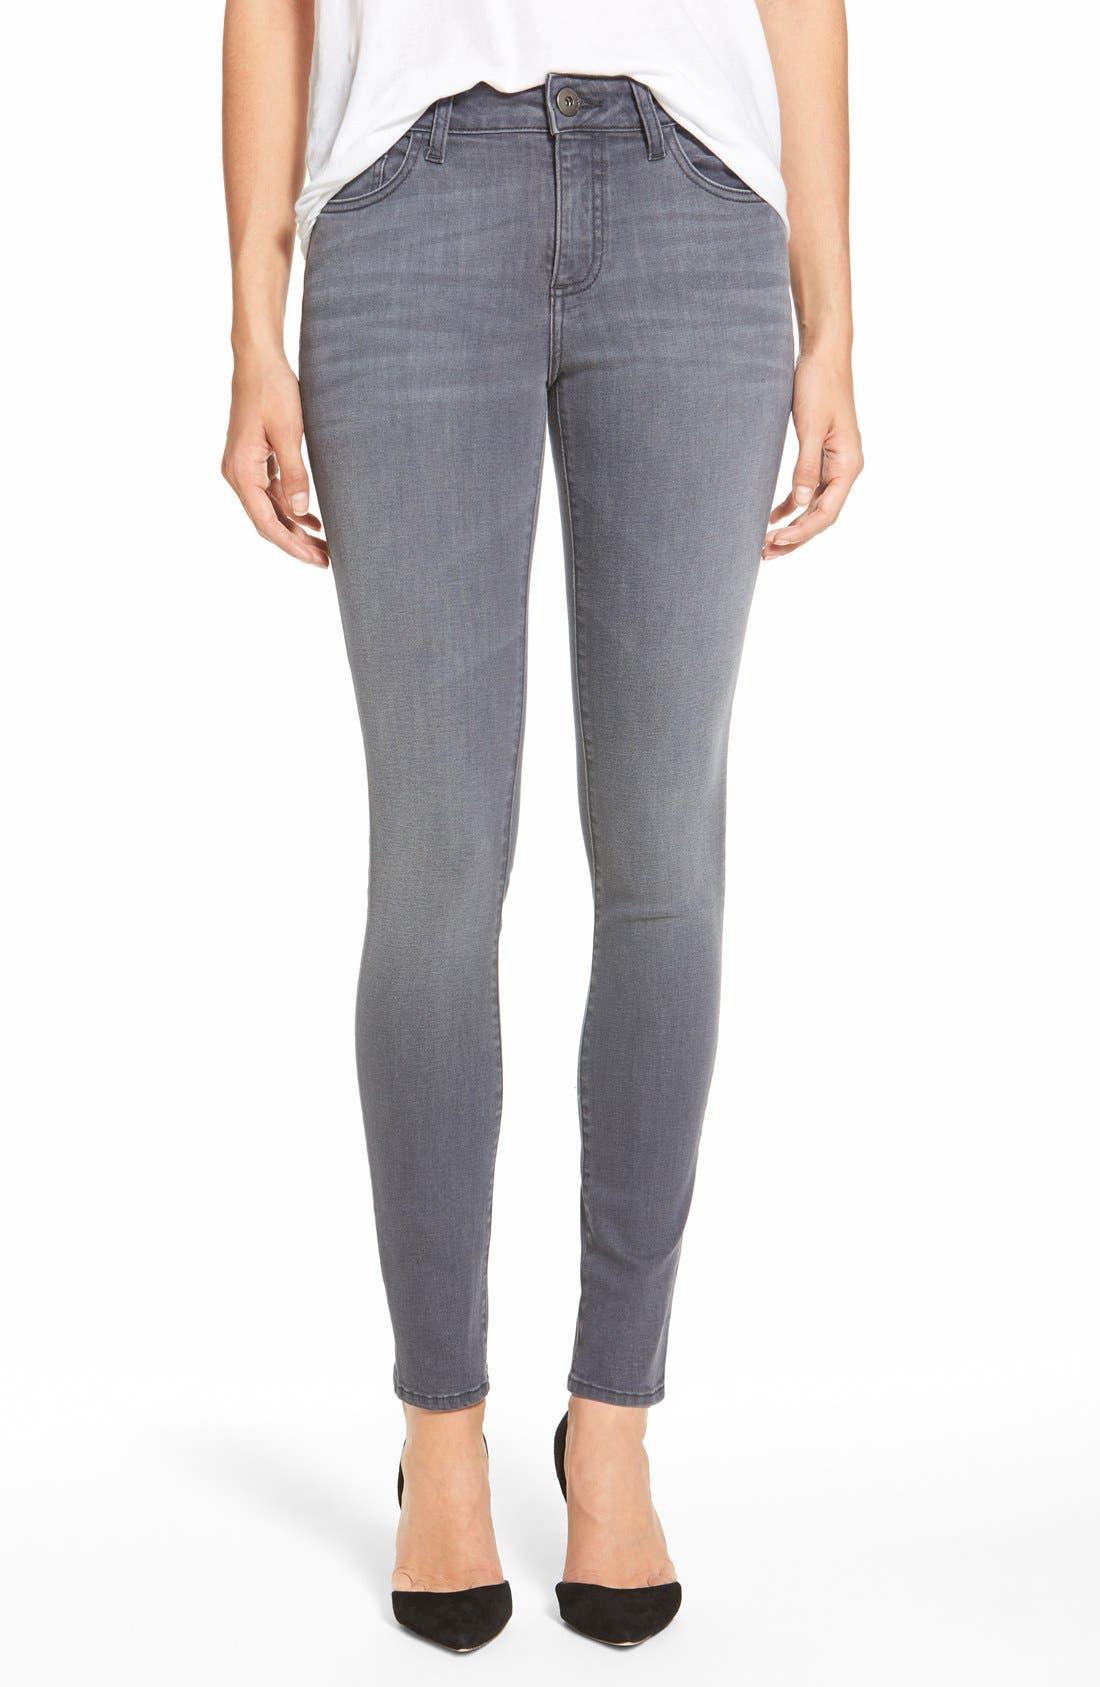 Main Image - DL1961 'Florence' Instasculpt Skinny Jeans (Craft)